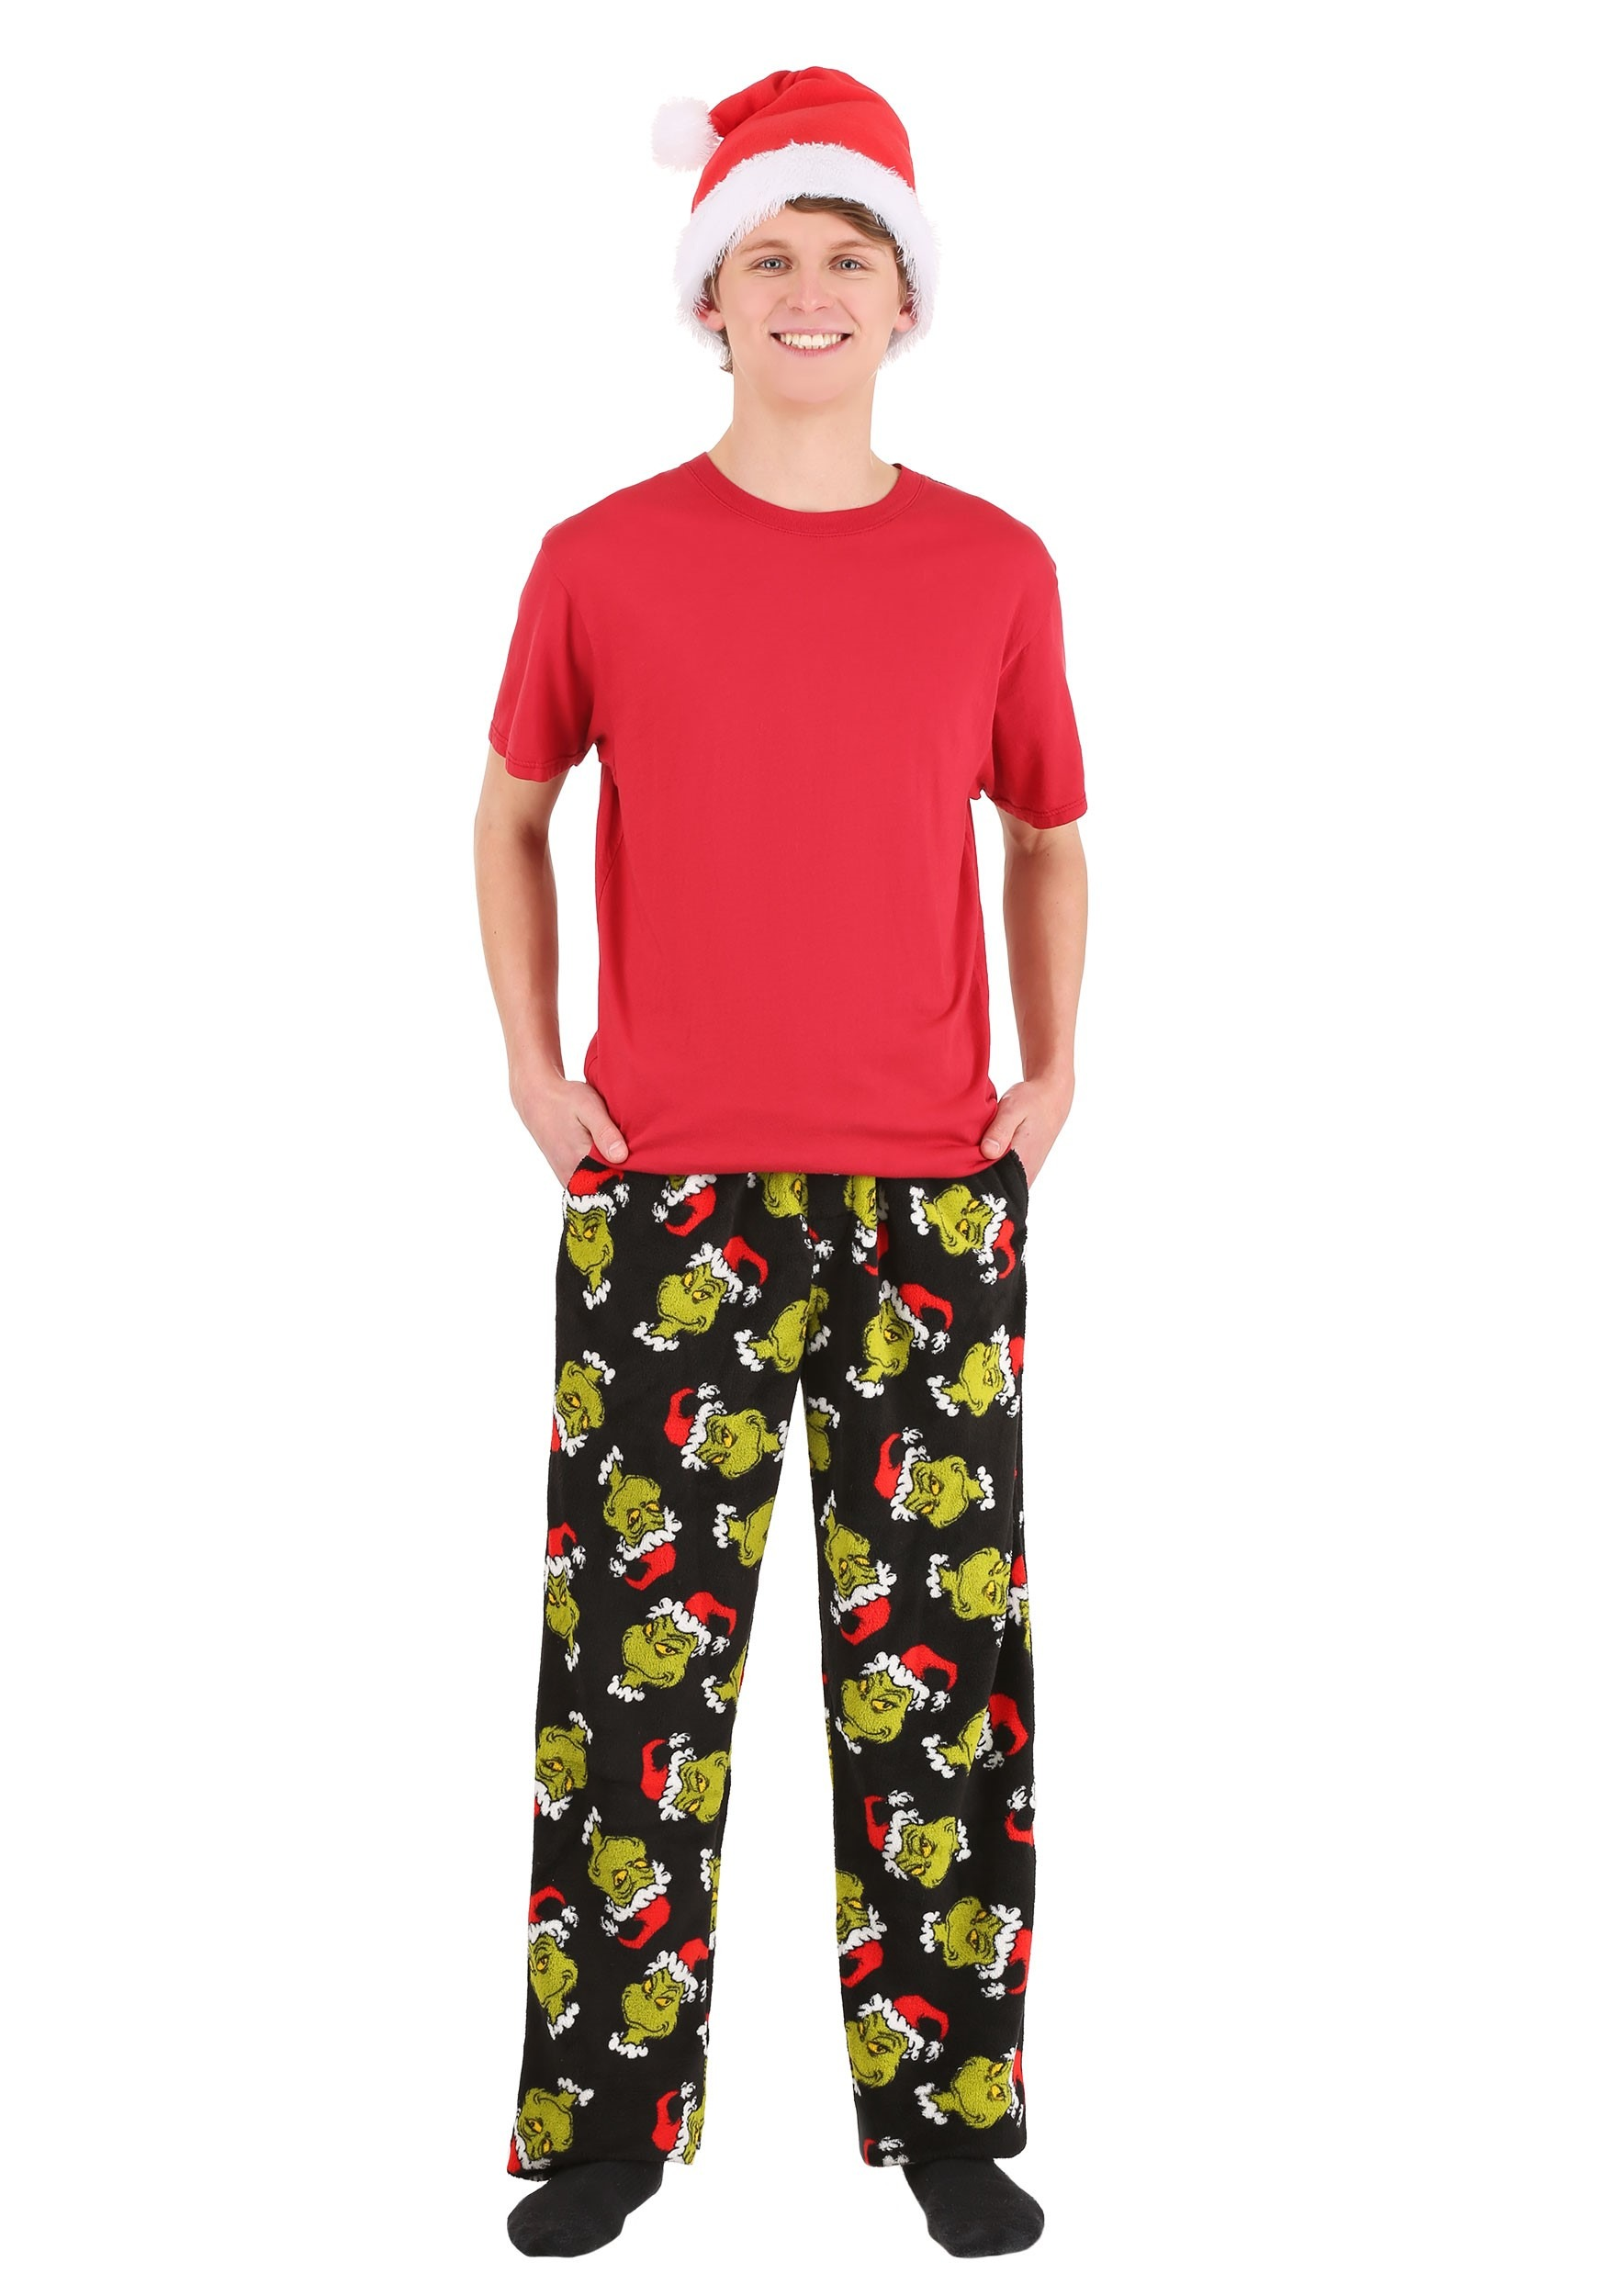 Grinch Lounge Pants with Santa Hat